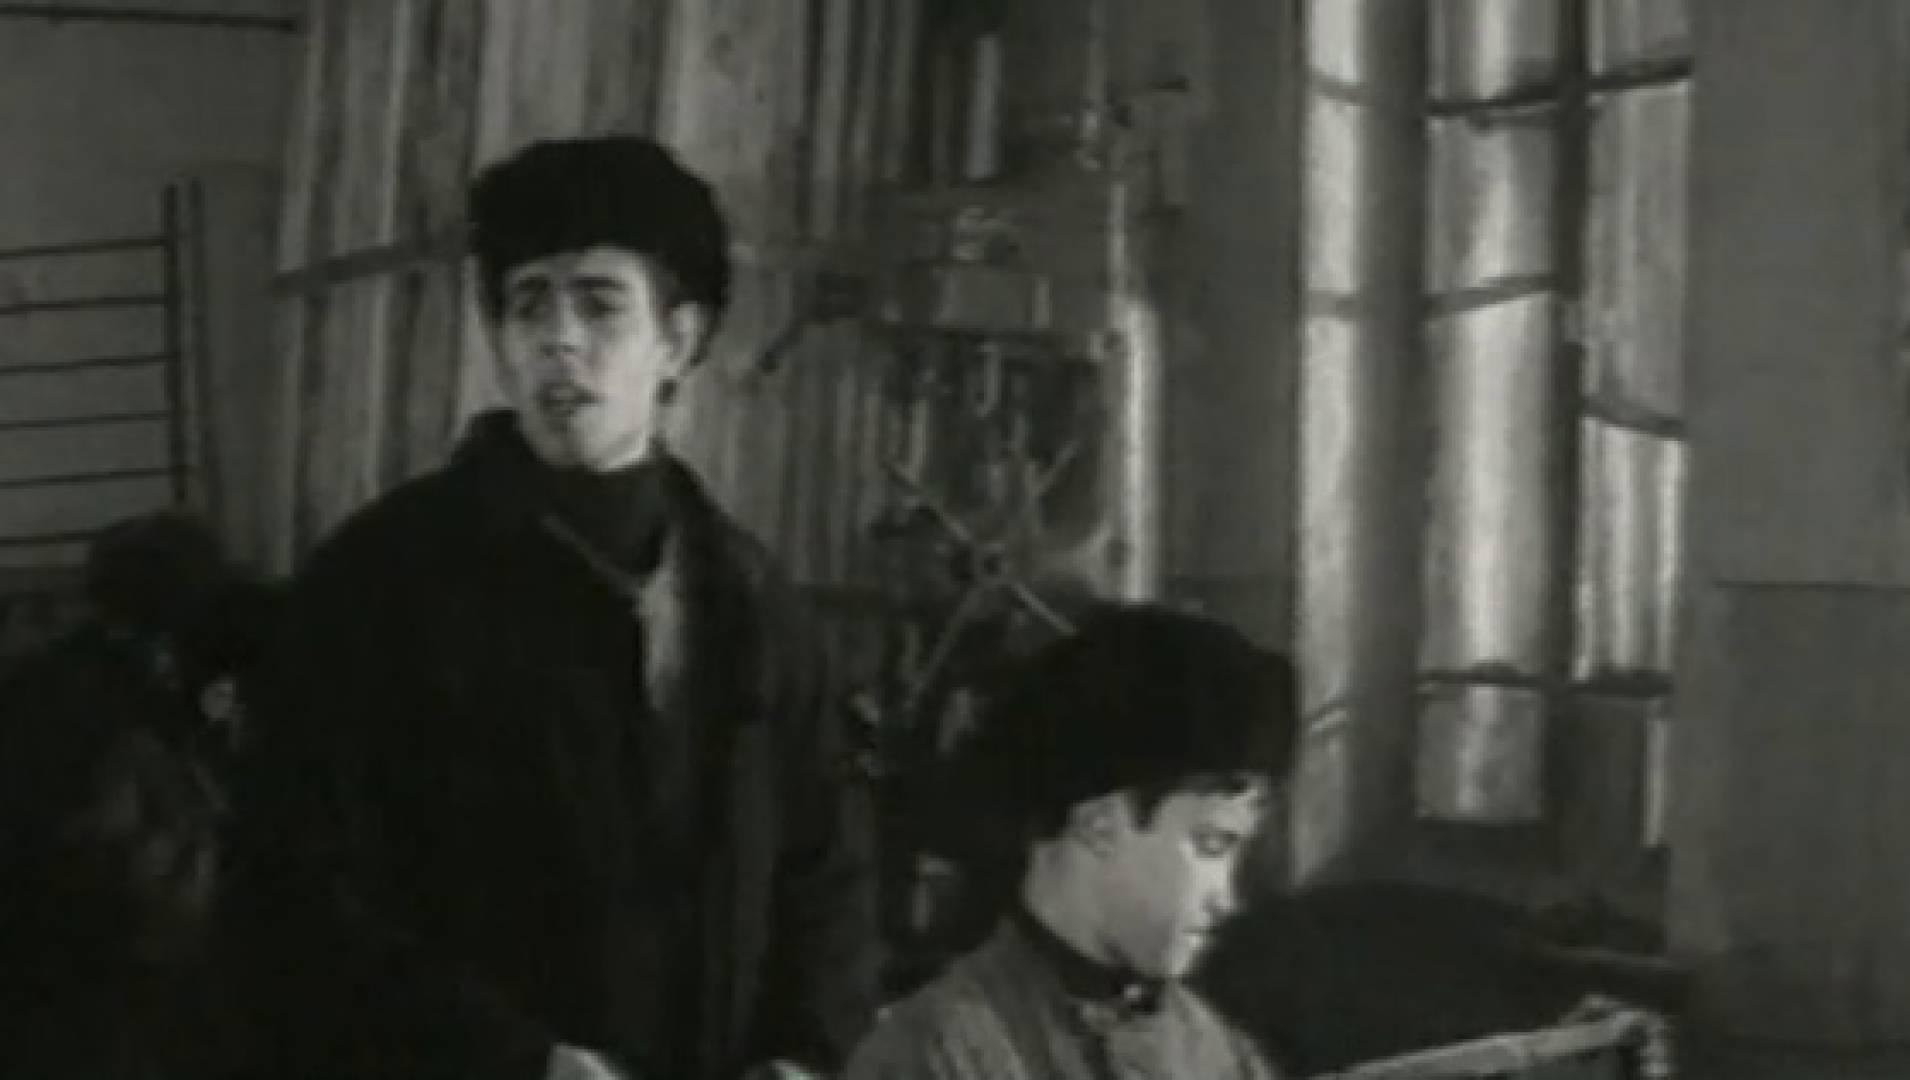 Мальчишки ехали на фронт - Драма, Фильм